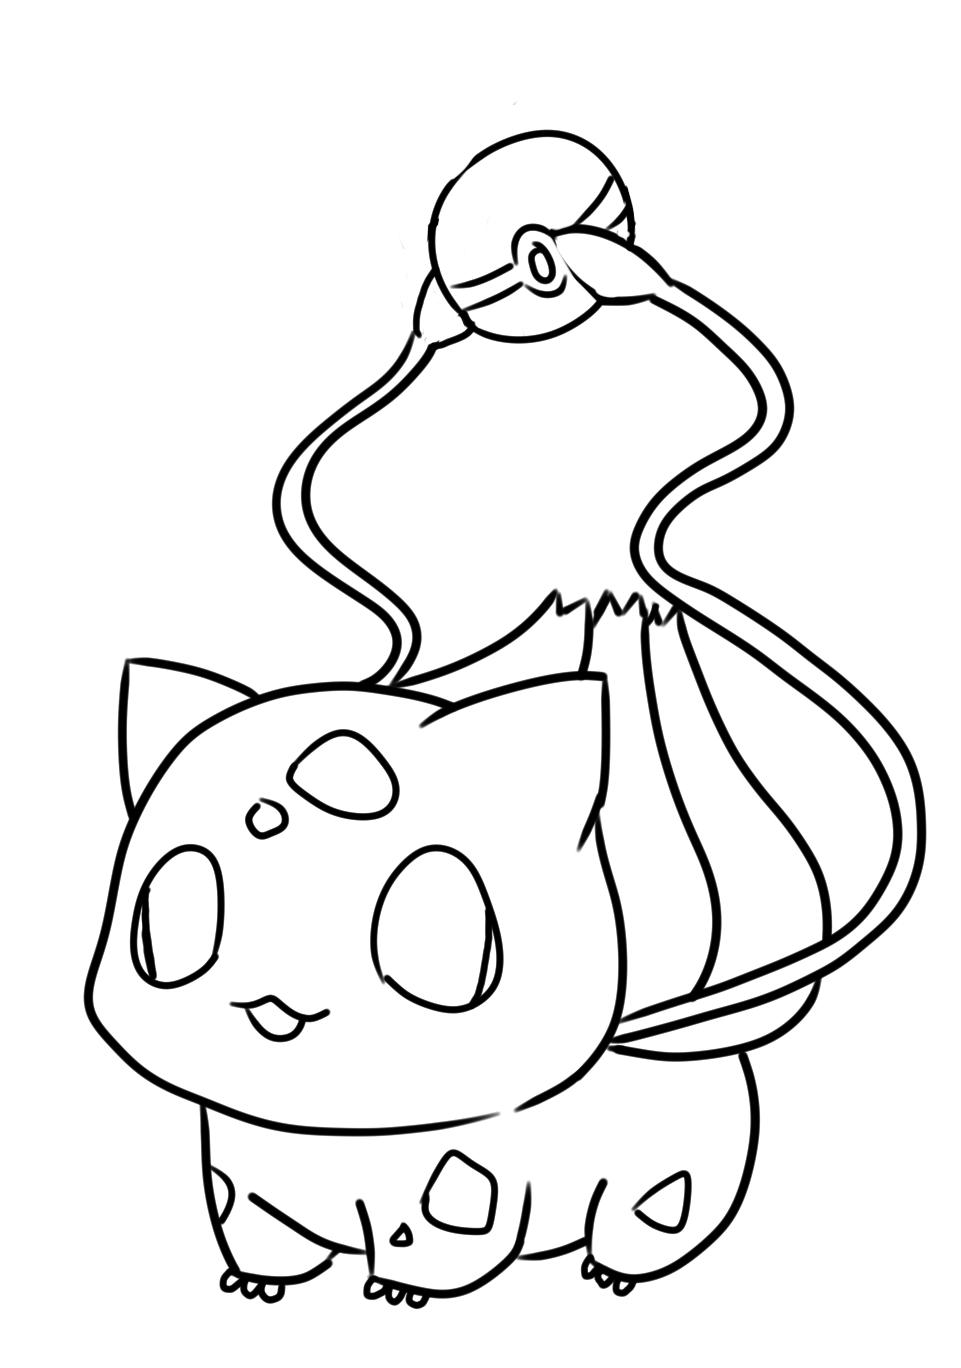 Kawaii Pokemon Bulbasaur Coloring Pages Pokemon Bulbasaur Coloring Pages Pokemon Coloring